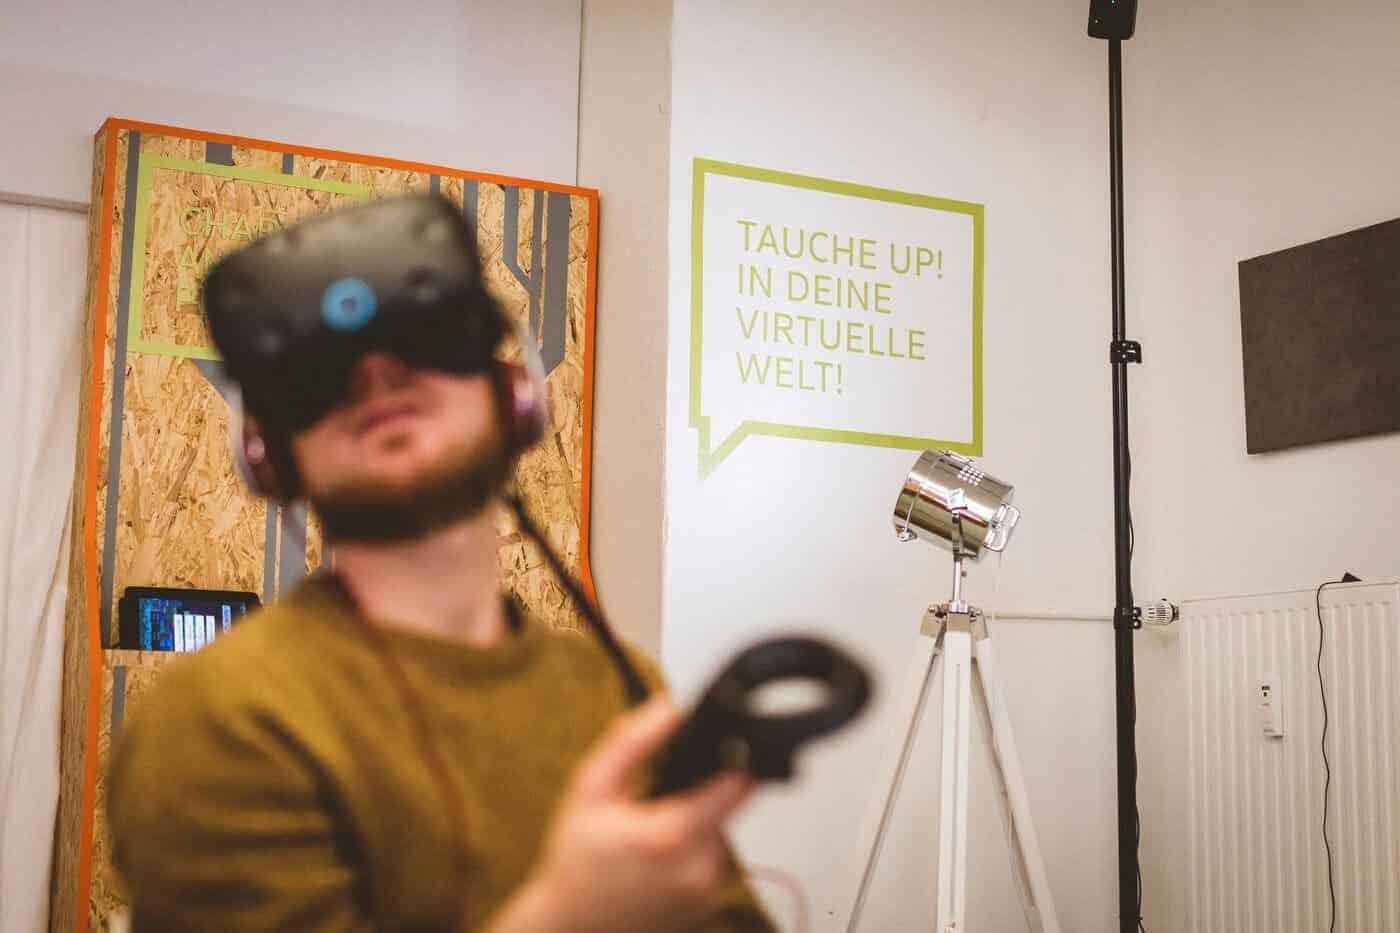 Event virtual reality vr photographer hamburg facebook